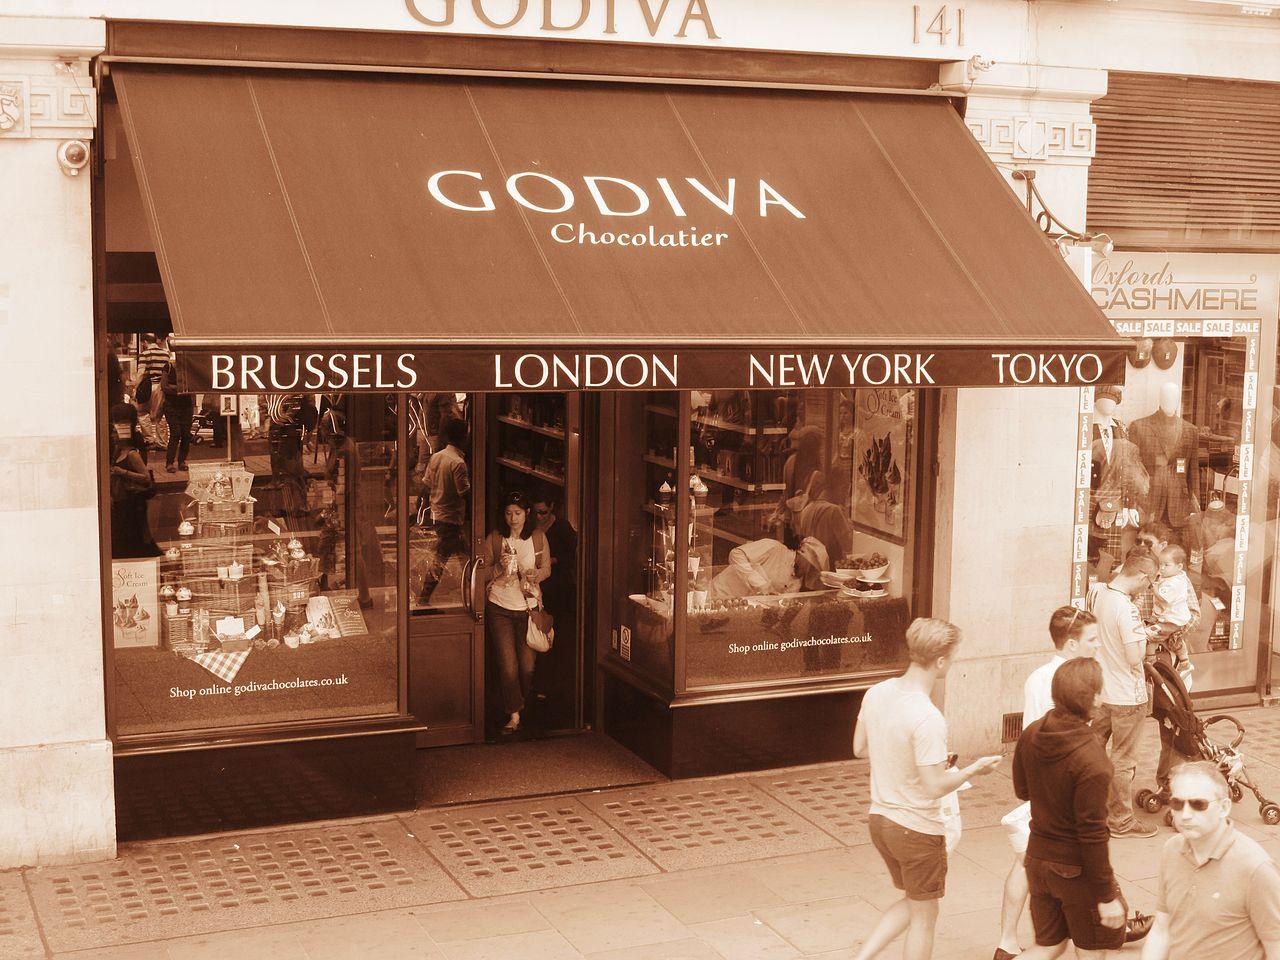 GODIVA Chocolatier since 1926